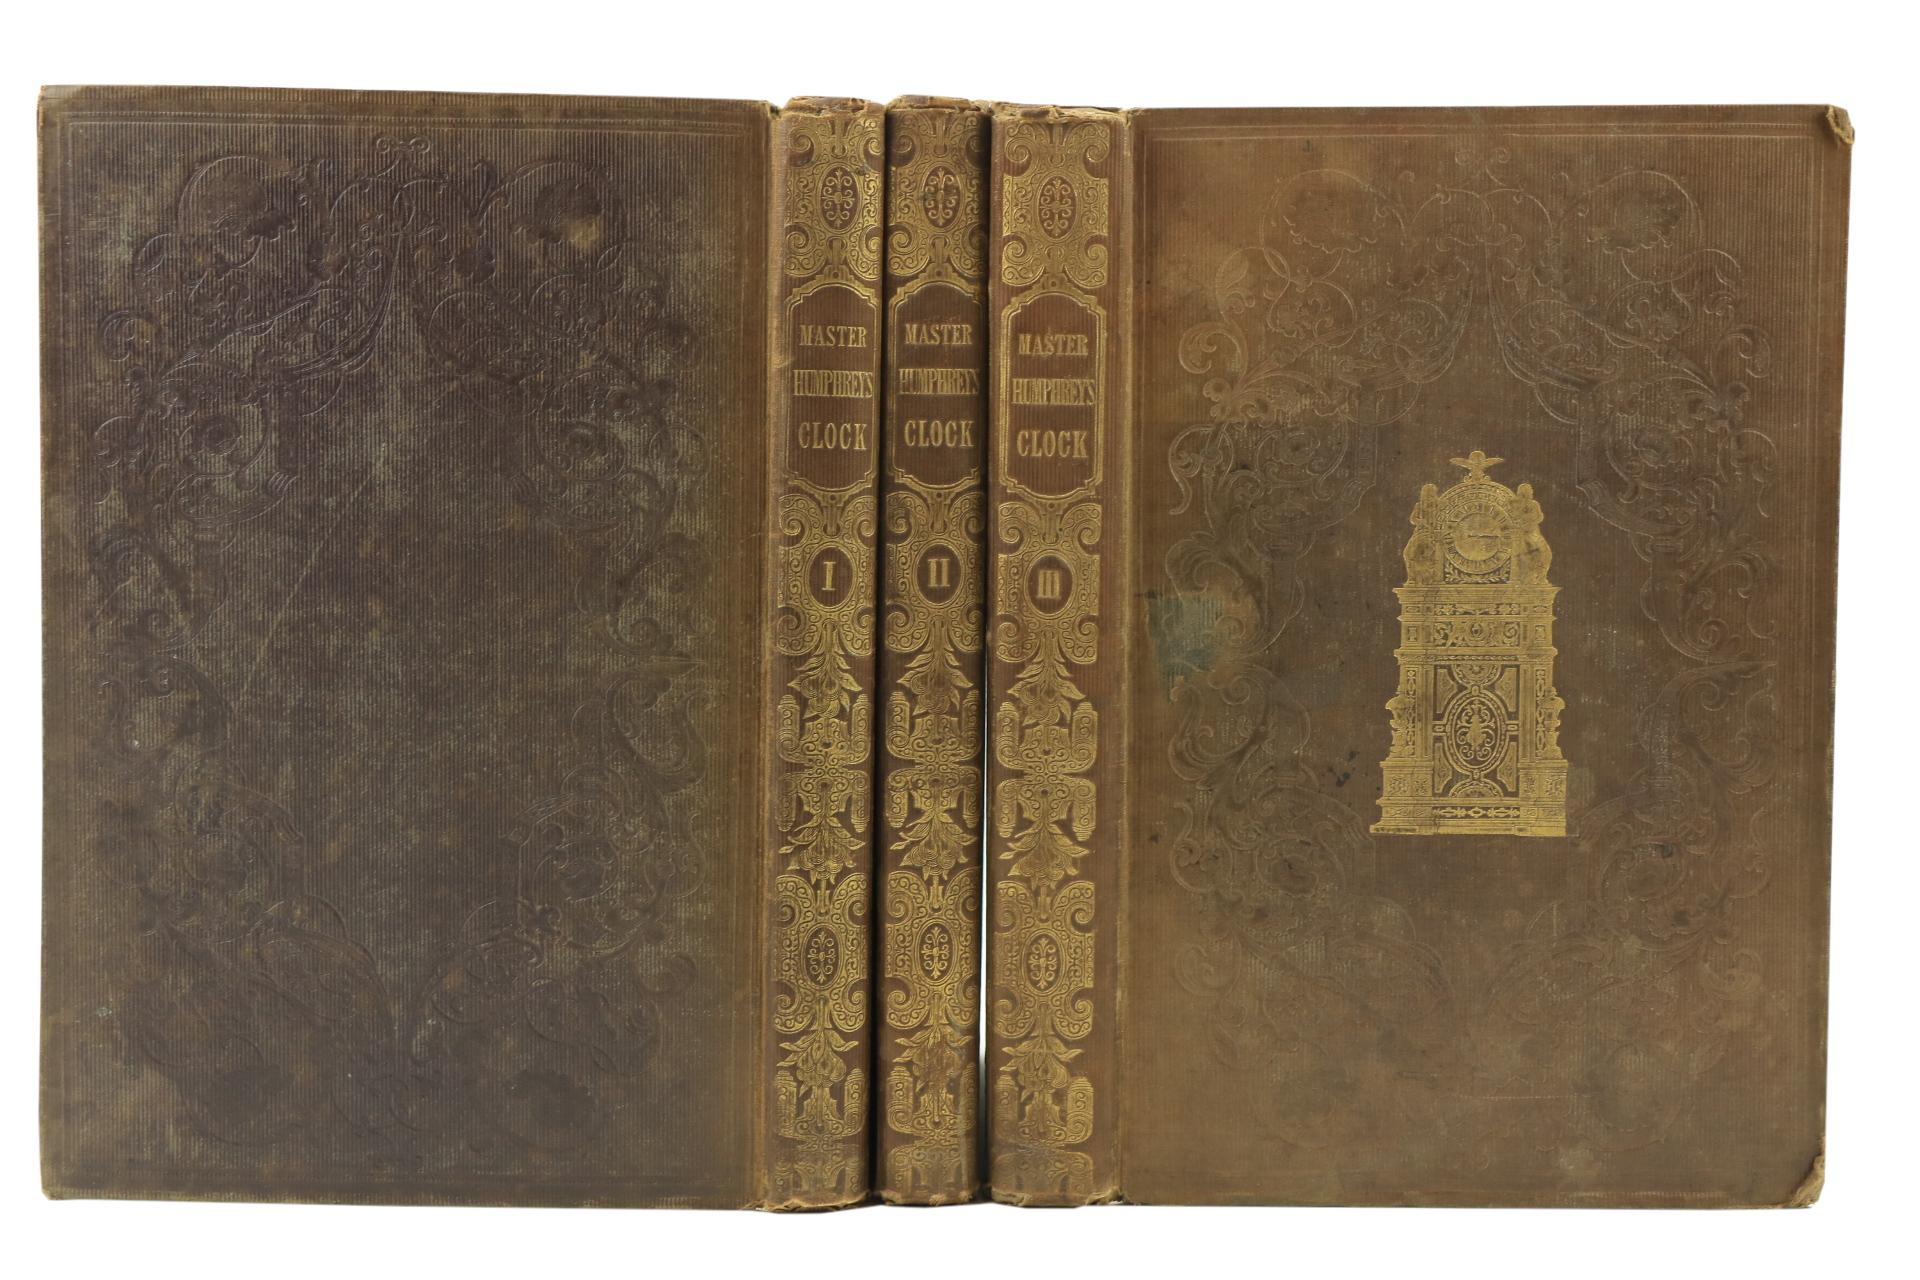 Dickens (Charles)ÿMaster Humphrey's clock, 3 vols. folio L. (Chapman & Hall) 1840.ÿFirst Edn.,